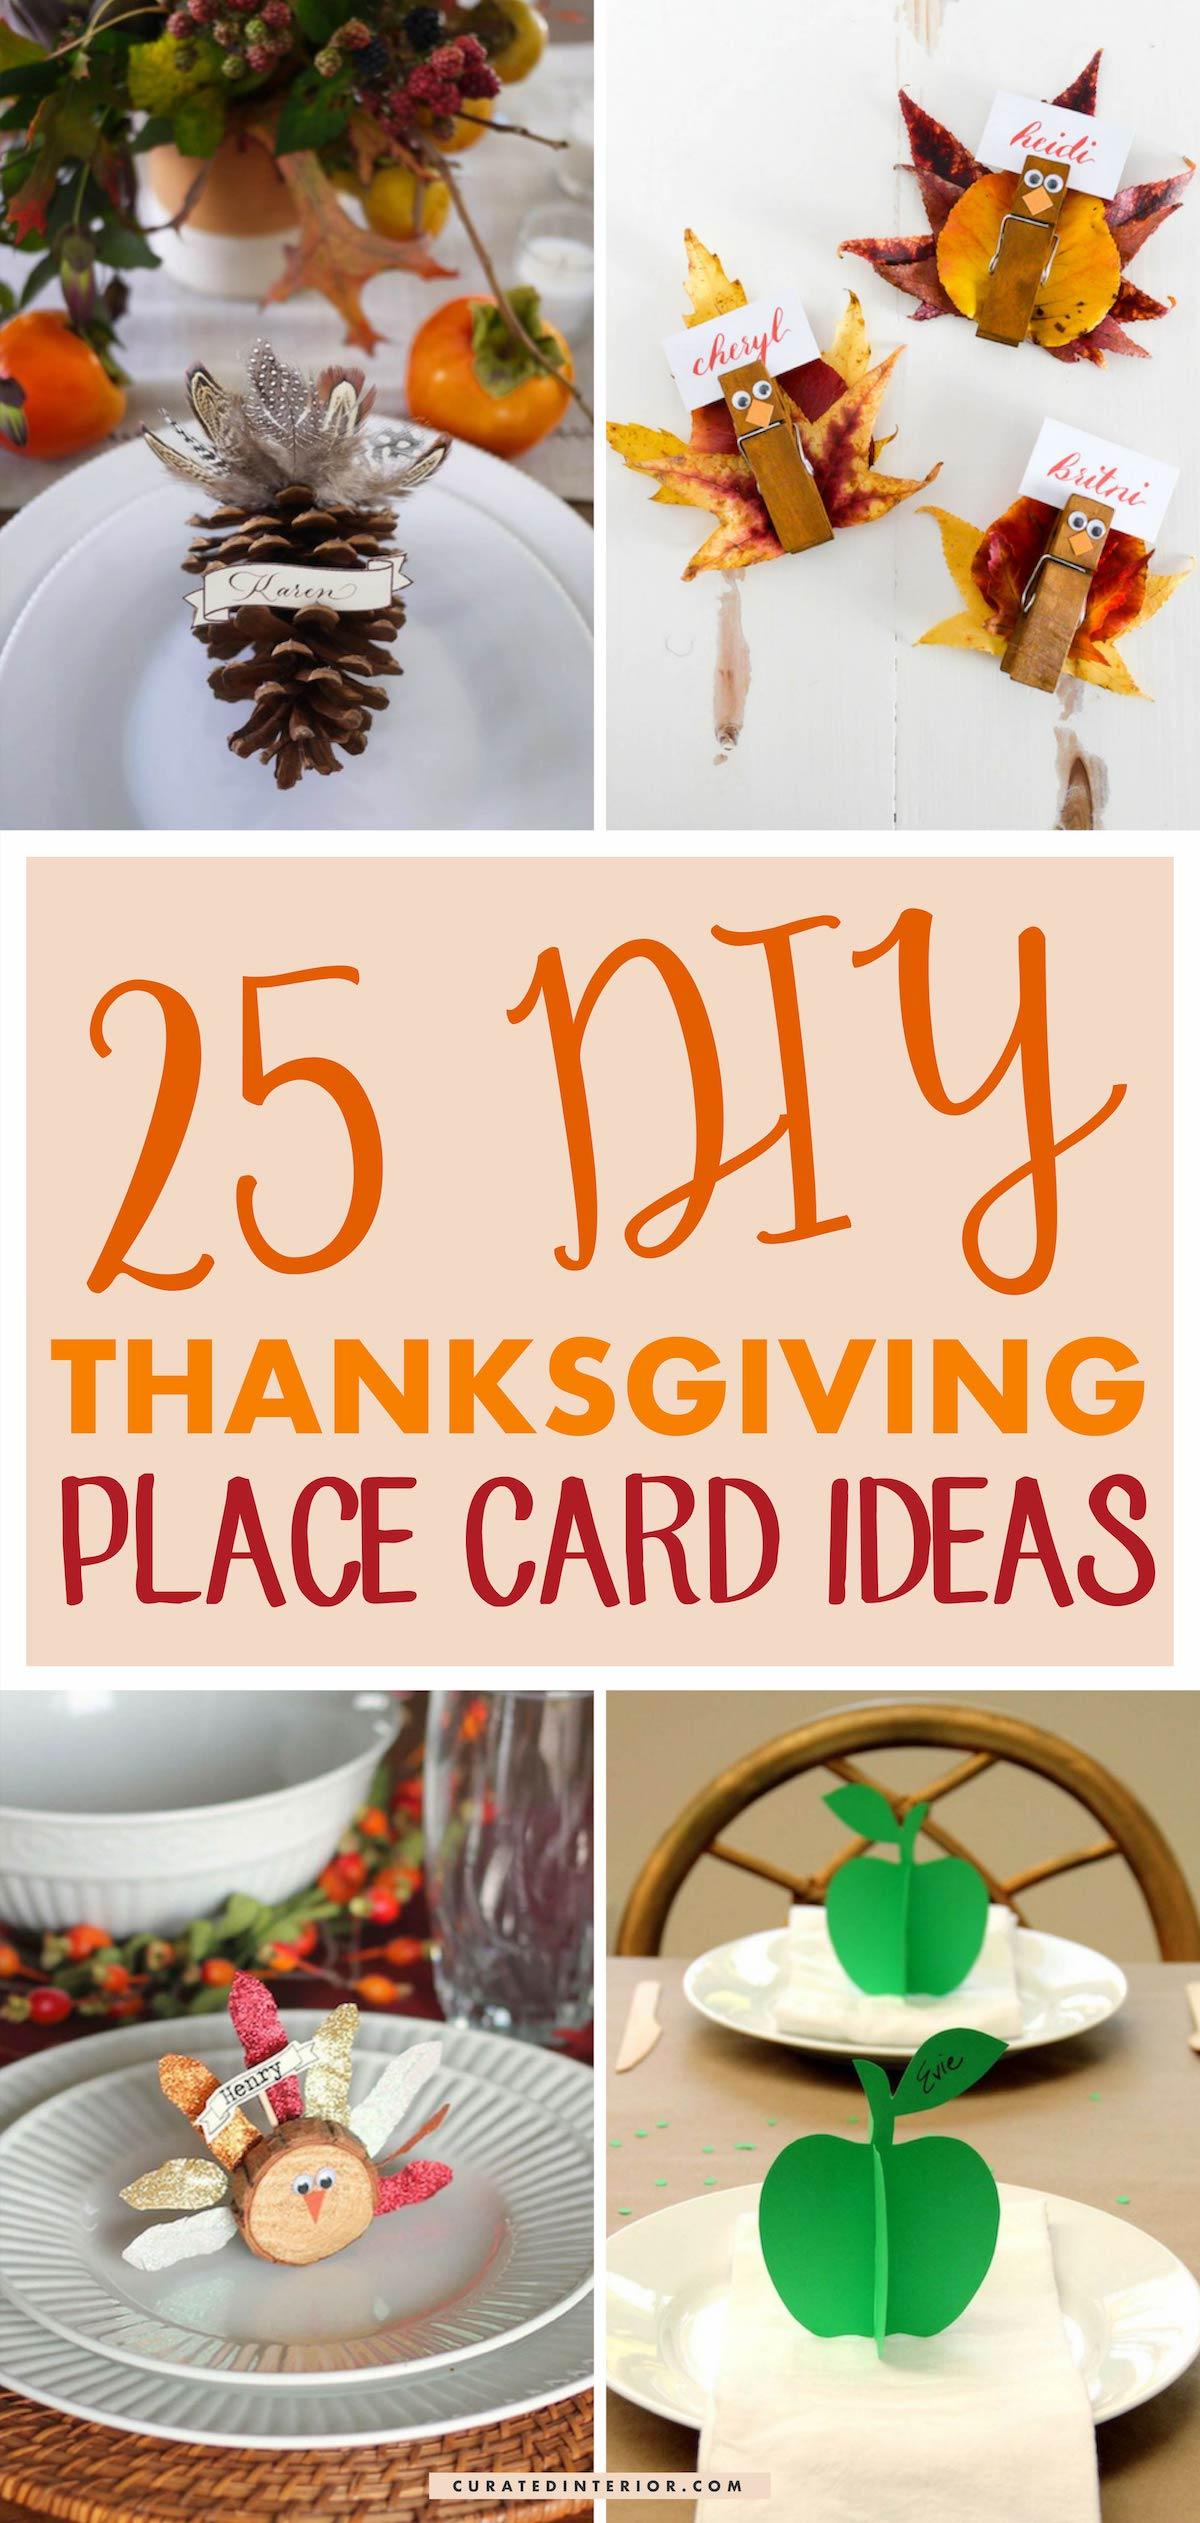 25 DIY Thanksgiving Place Card Ideas #Thanksgiving #ThanksgivingDecor #ThanksgivingTable #ThanksgivingTableDecor